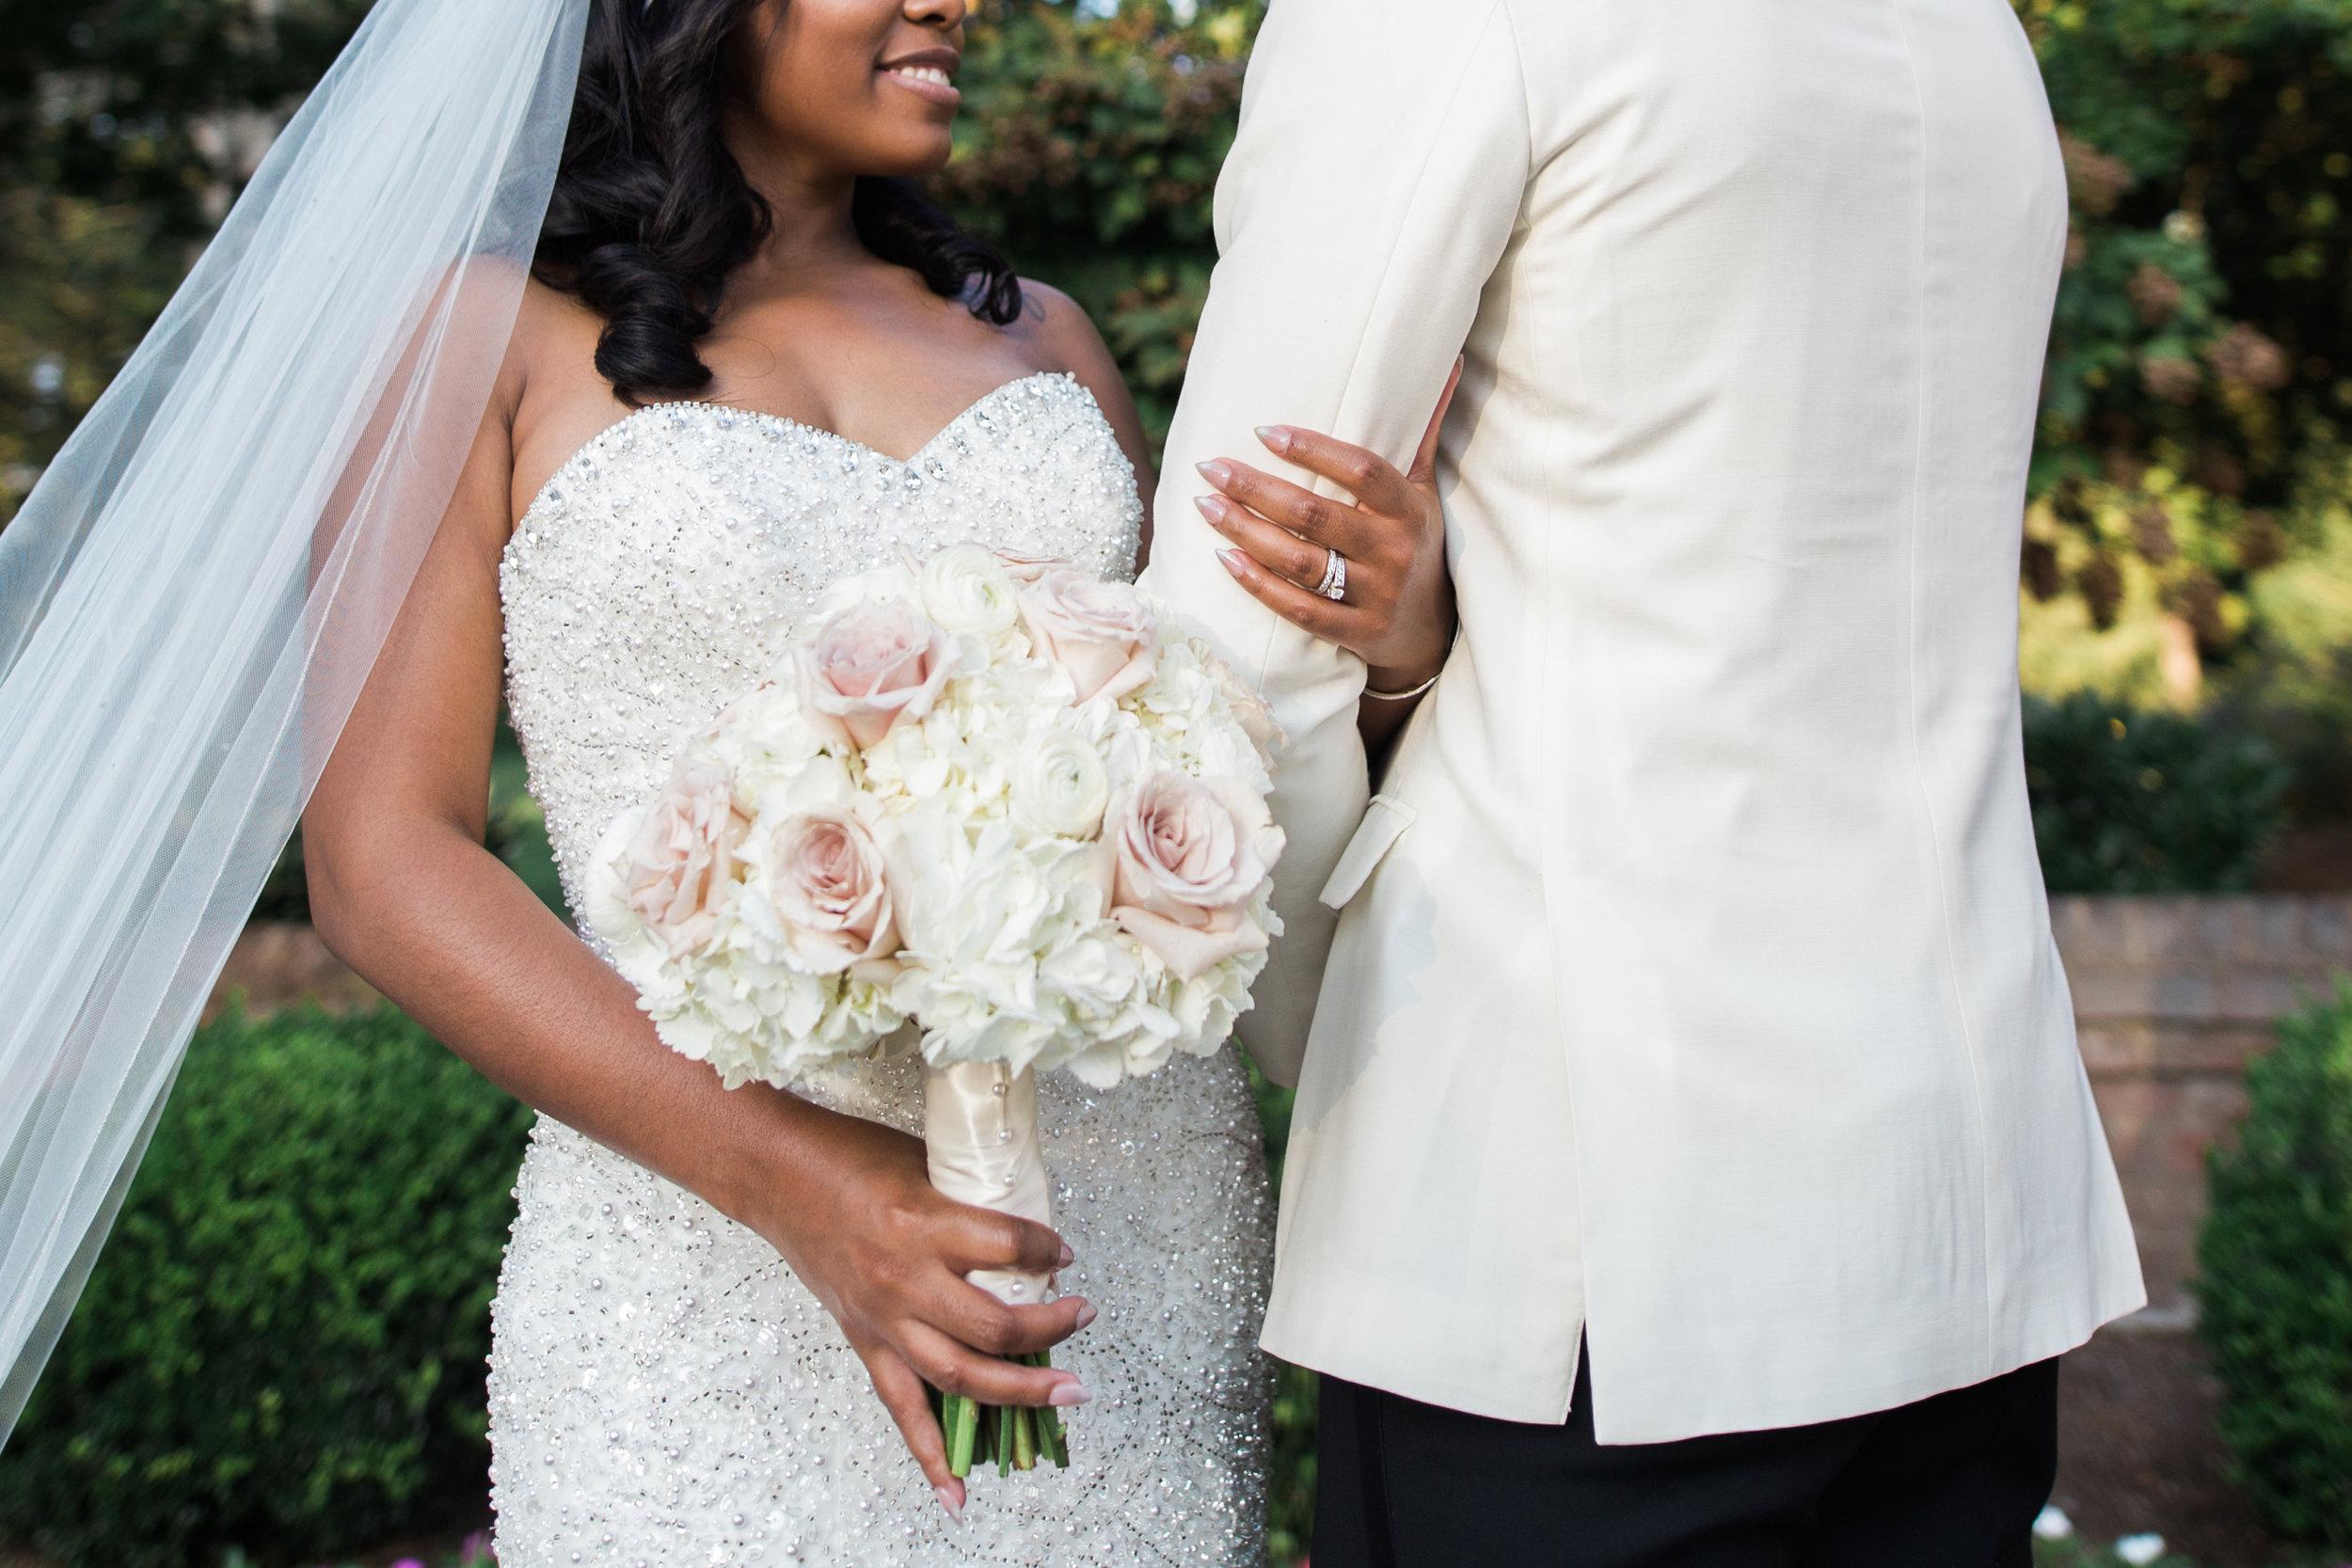 Black Wedding Photographer in Washington DC Megapixels Media black bride with bridal bouquet.jpg